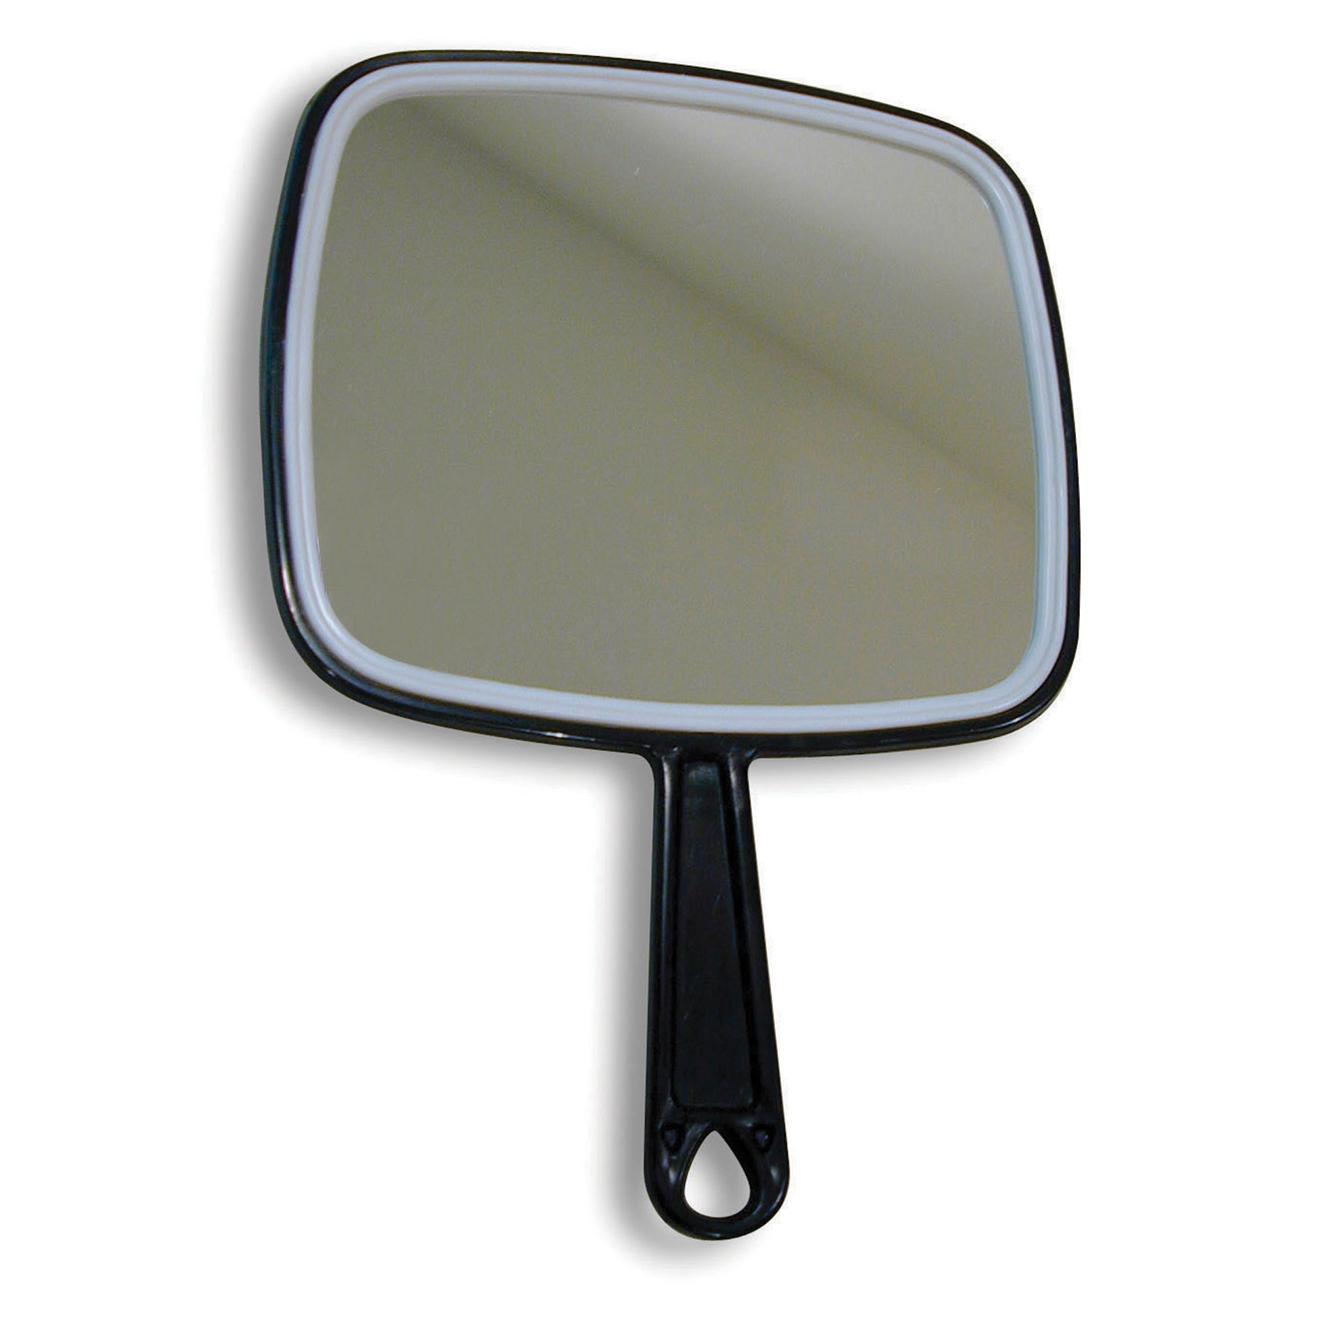 mirror mirror on the web essay